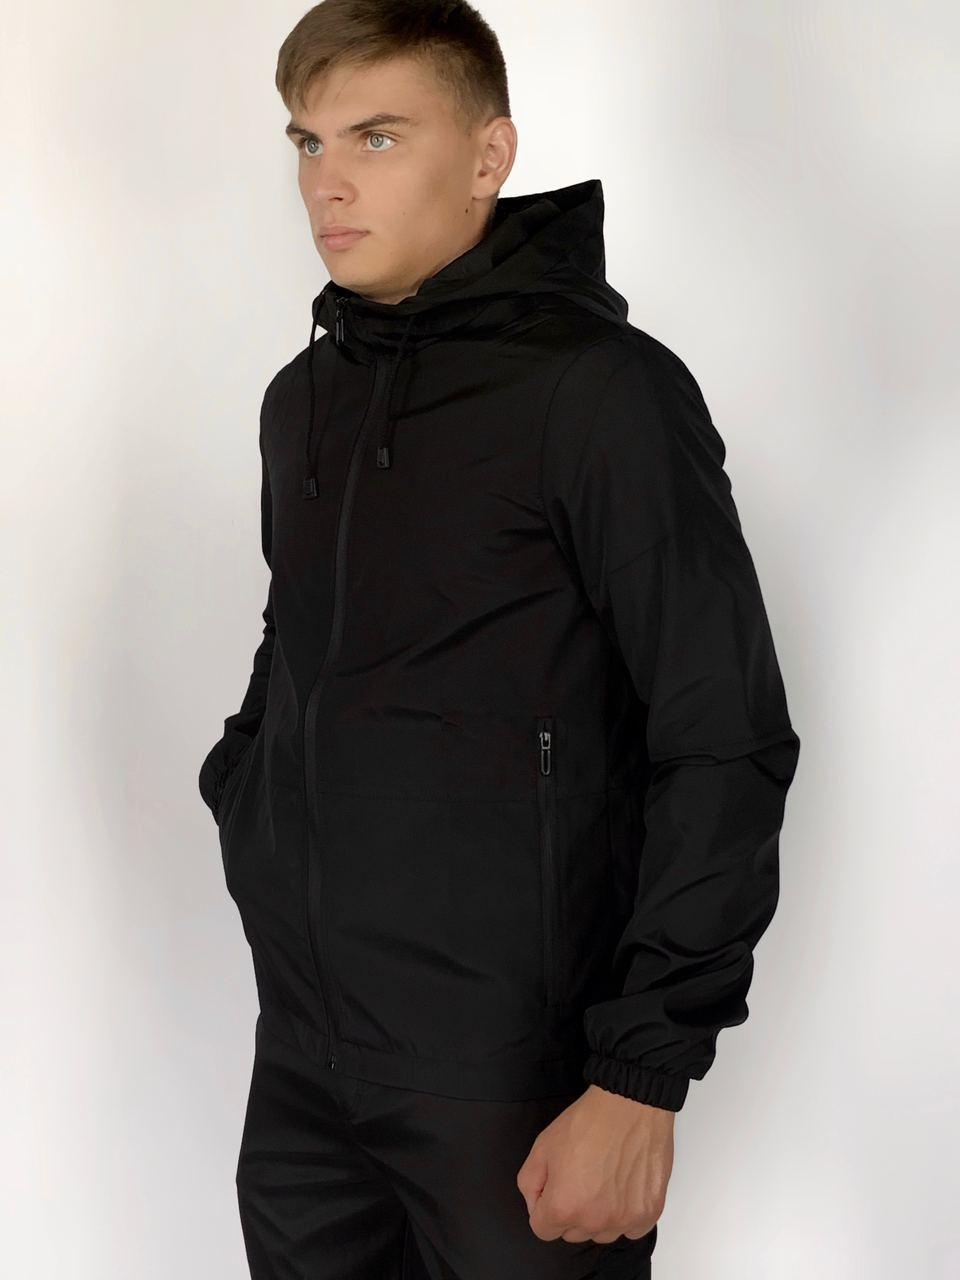 Куртка Softshell light Intruder М Черная (1589539088/1)